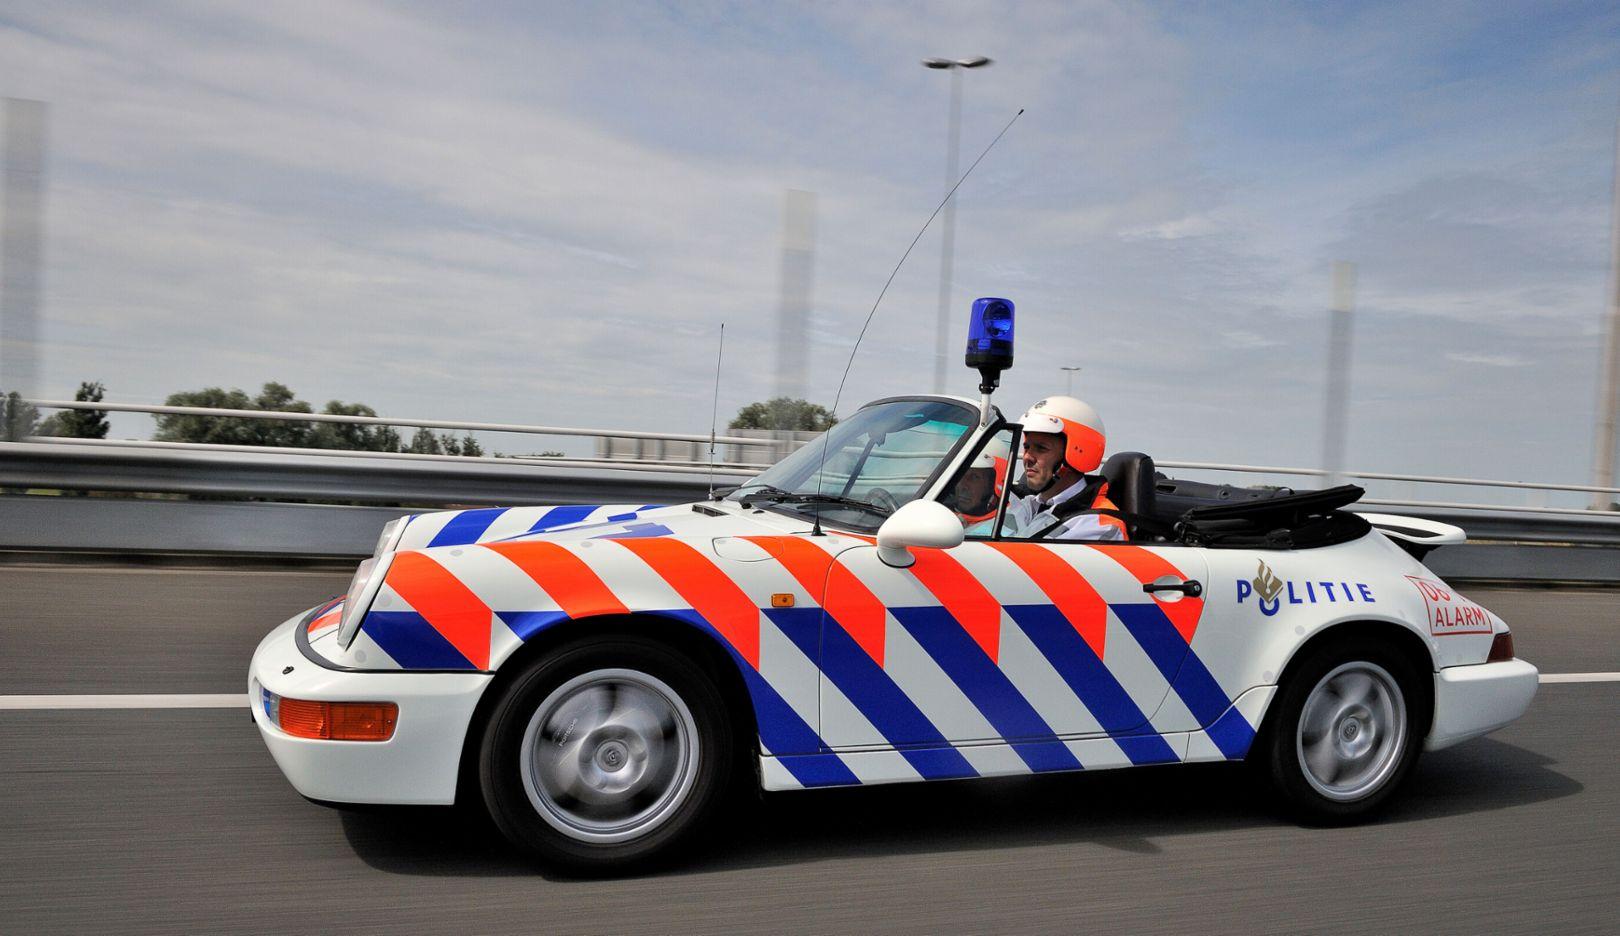 964 Cabriolet, Rijkspolitie, police, Netherlands, 2012, Porsche AG